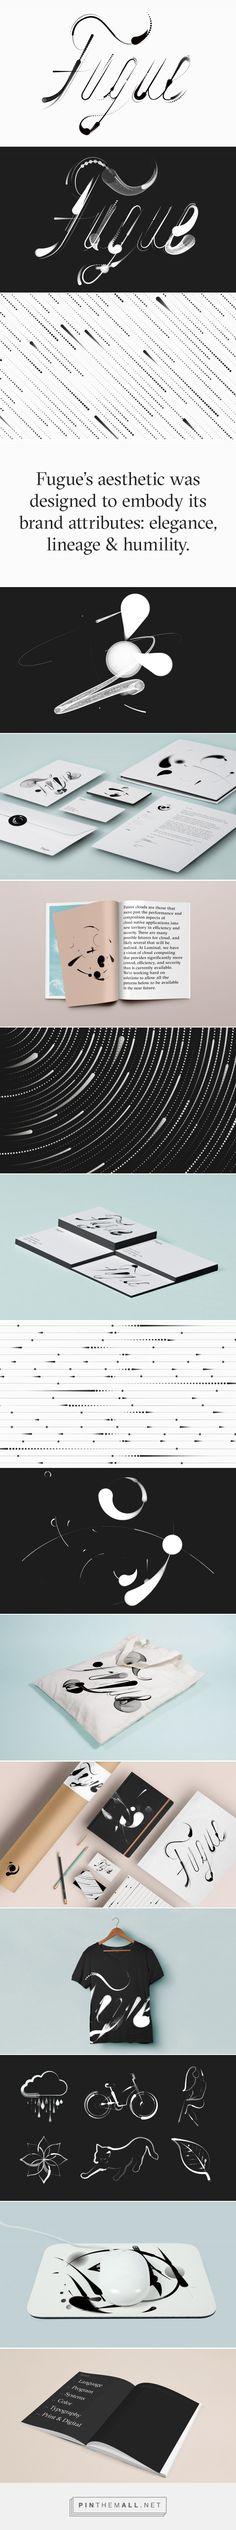 Fugue Identity - Work - Sagmeister & Walsh